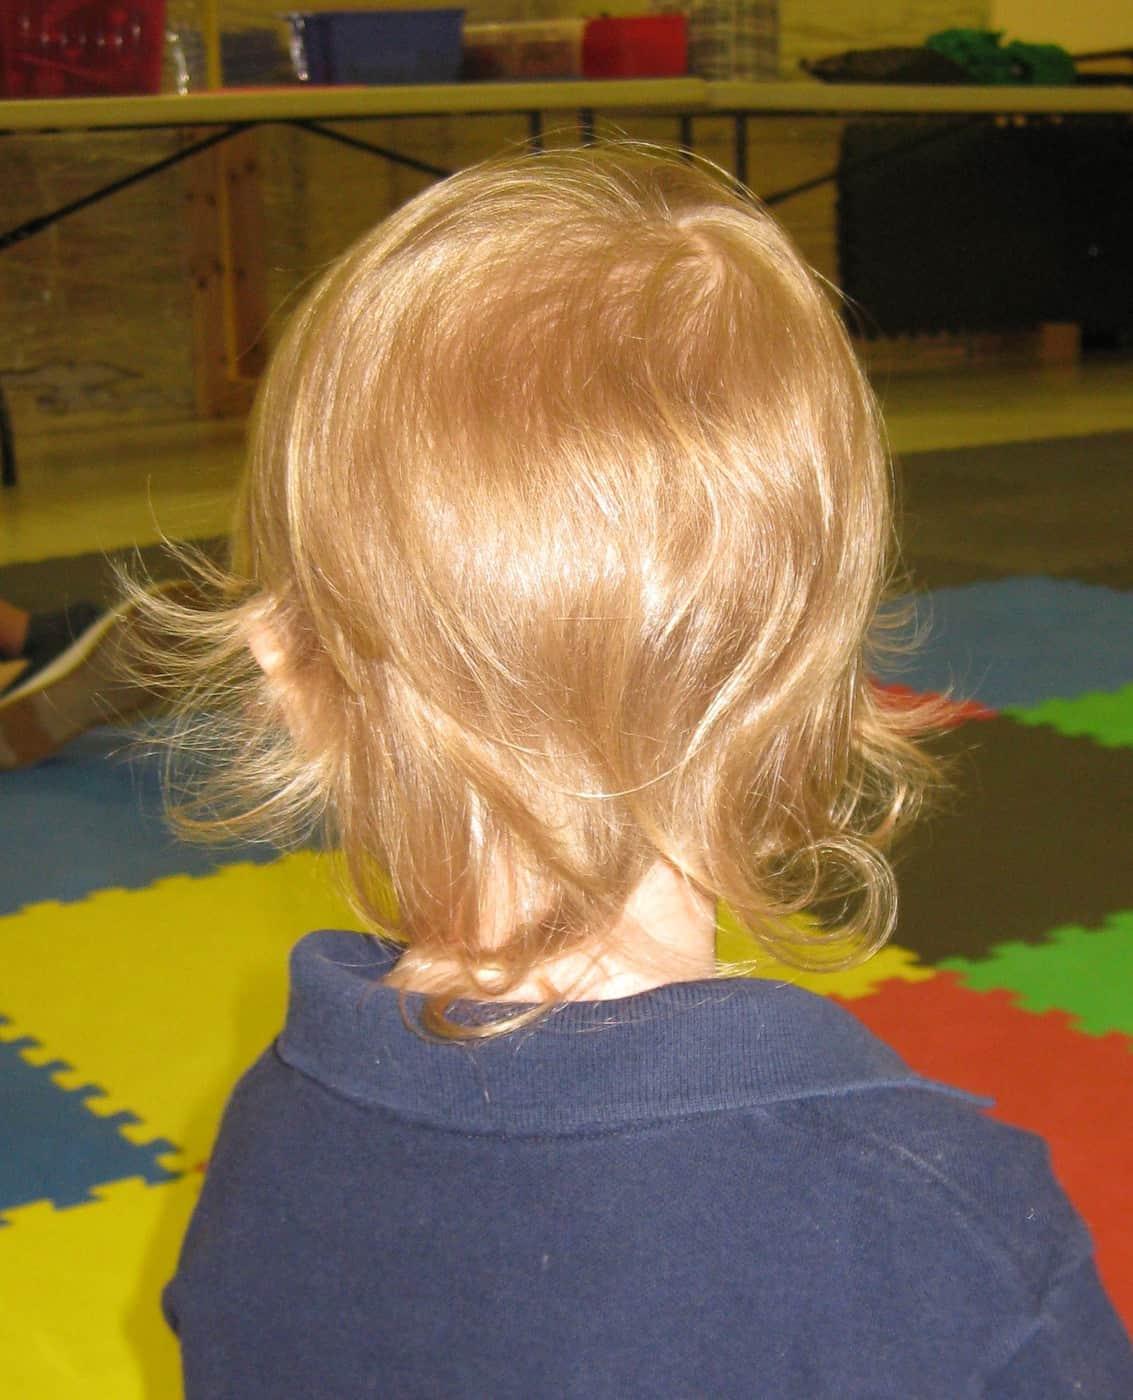 First Haircut For Little Boy Archives Dagmars Home